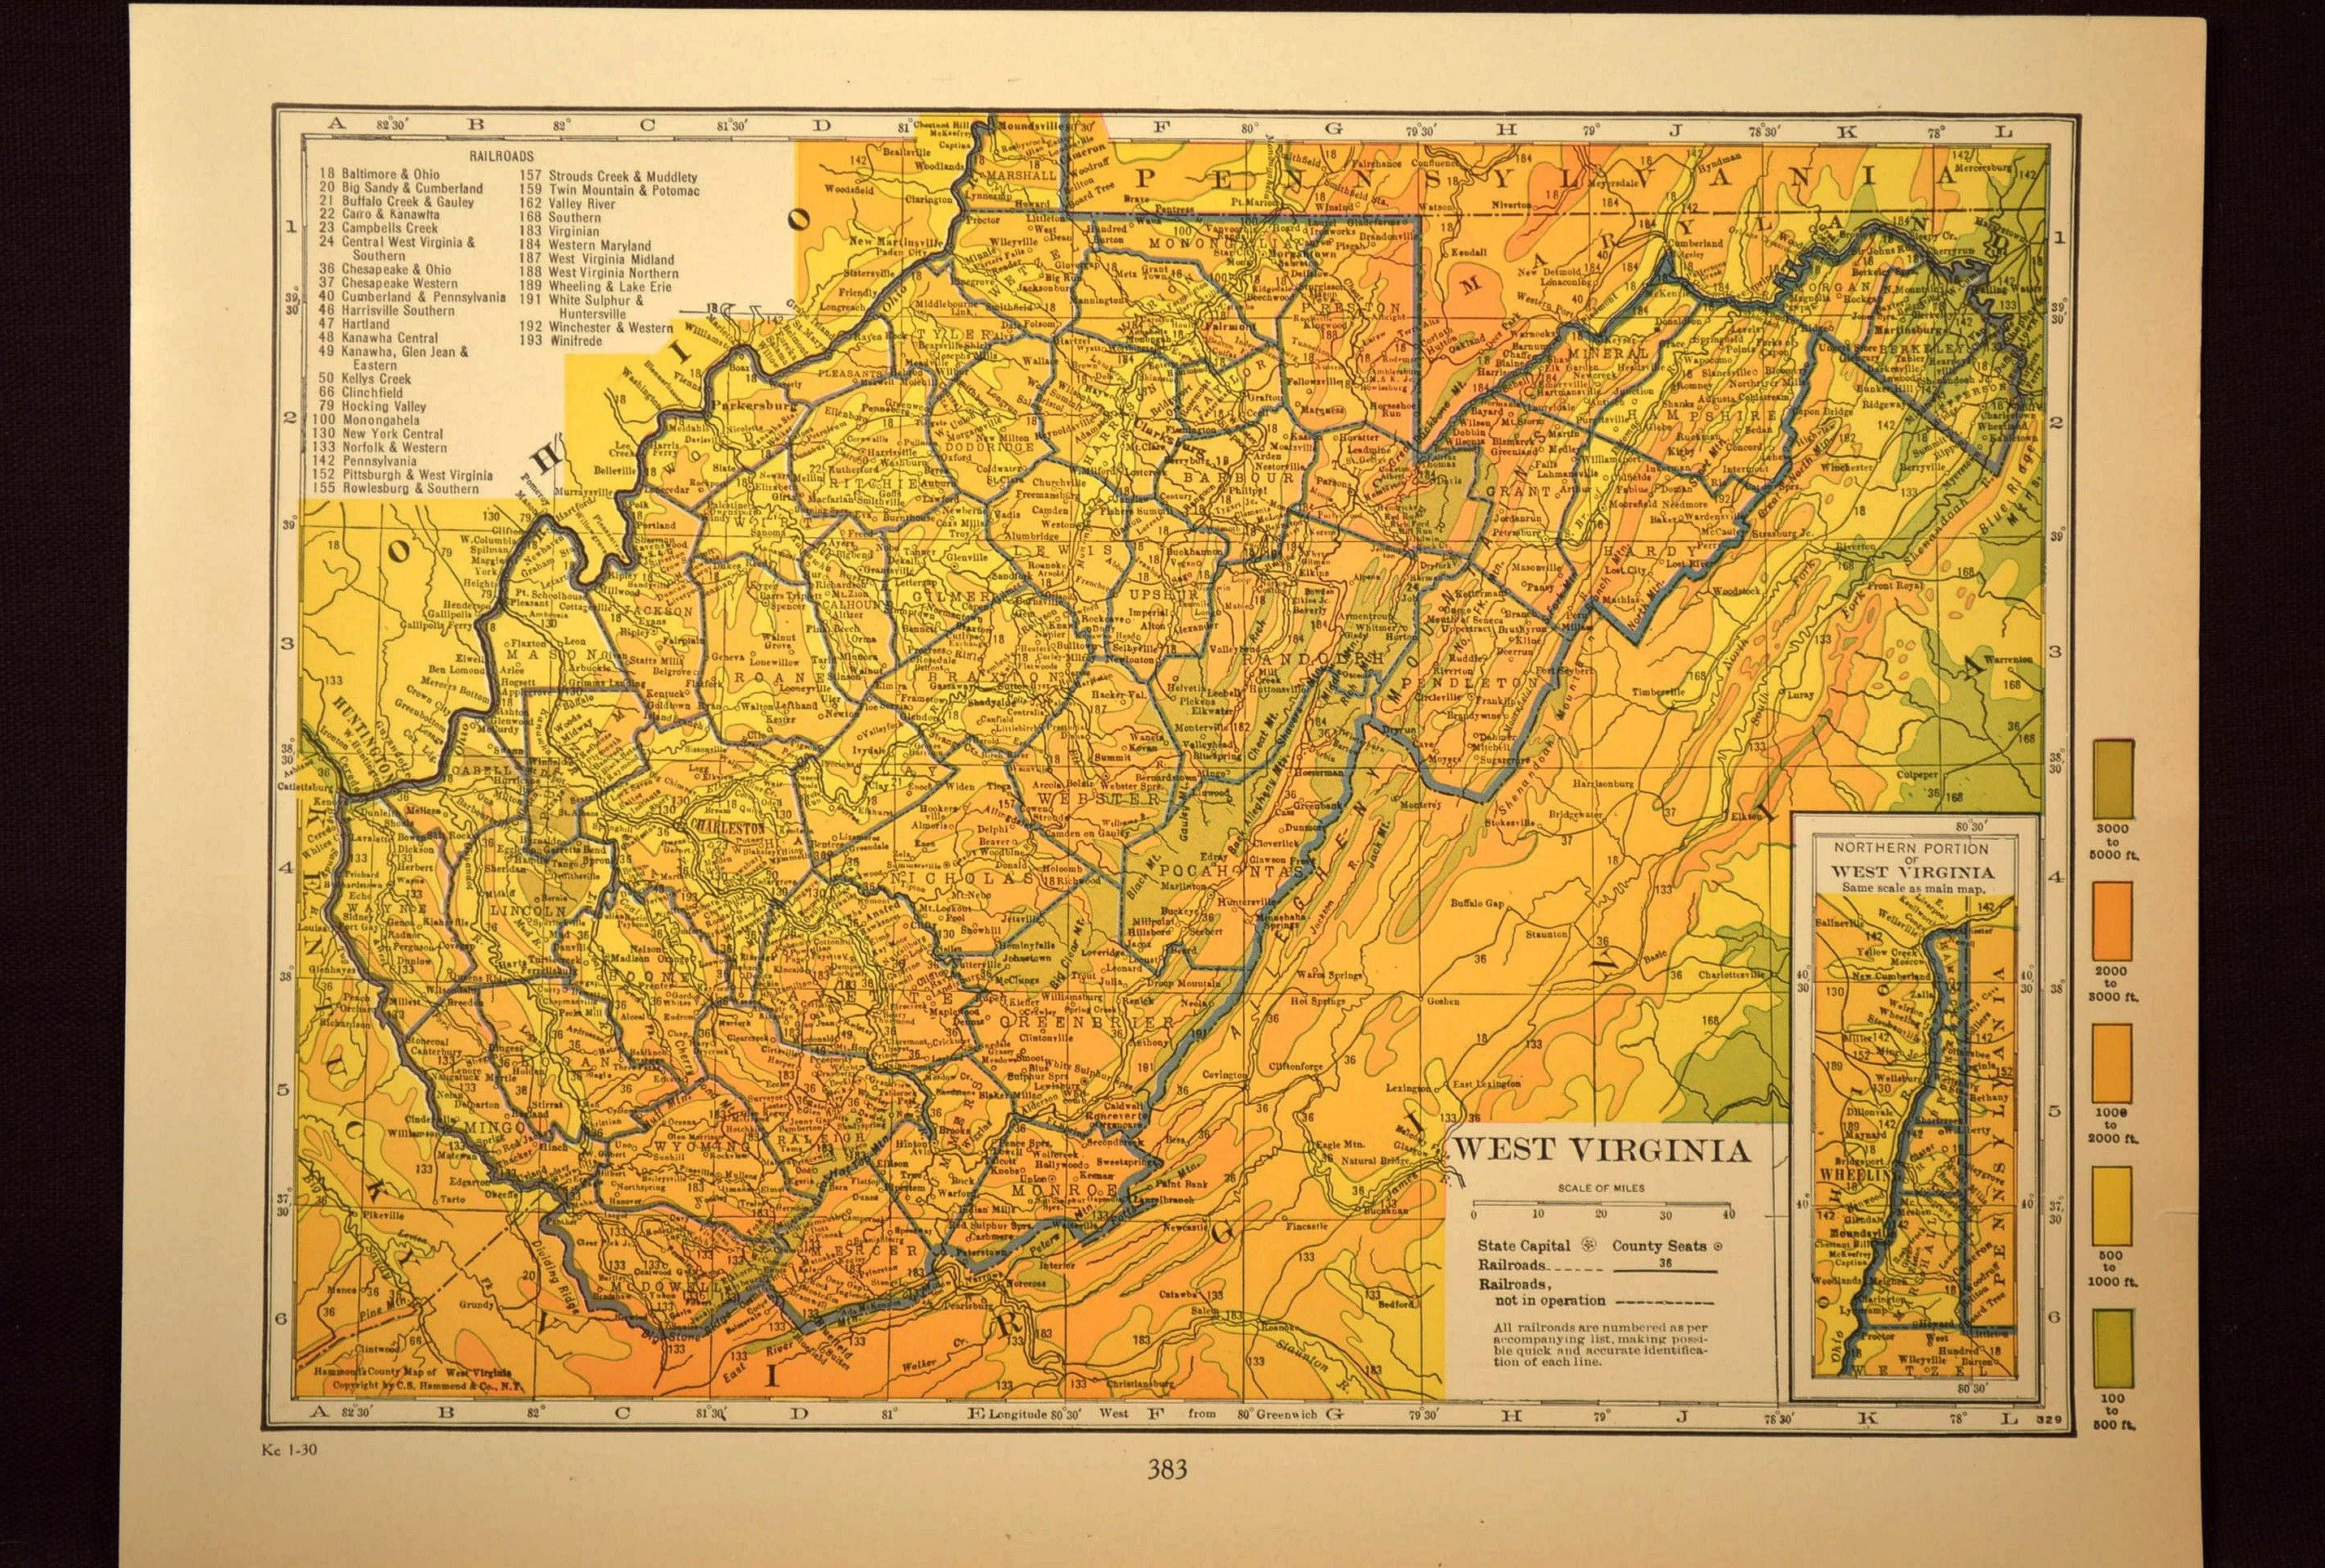 Topographic Map West Virginia.West Virginia Map Of West Virginia Wall Decor Art Topographic Etsy